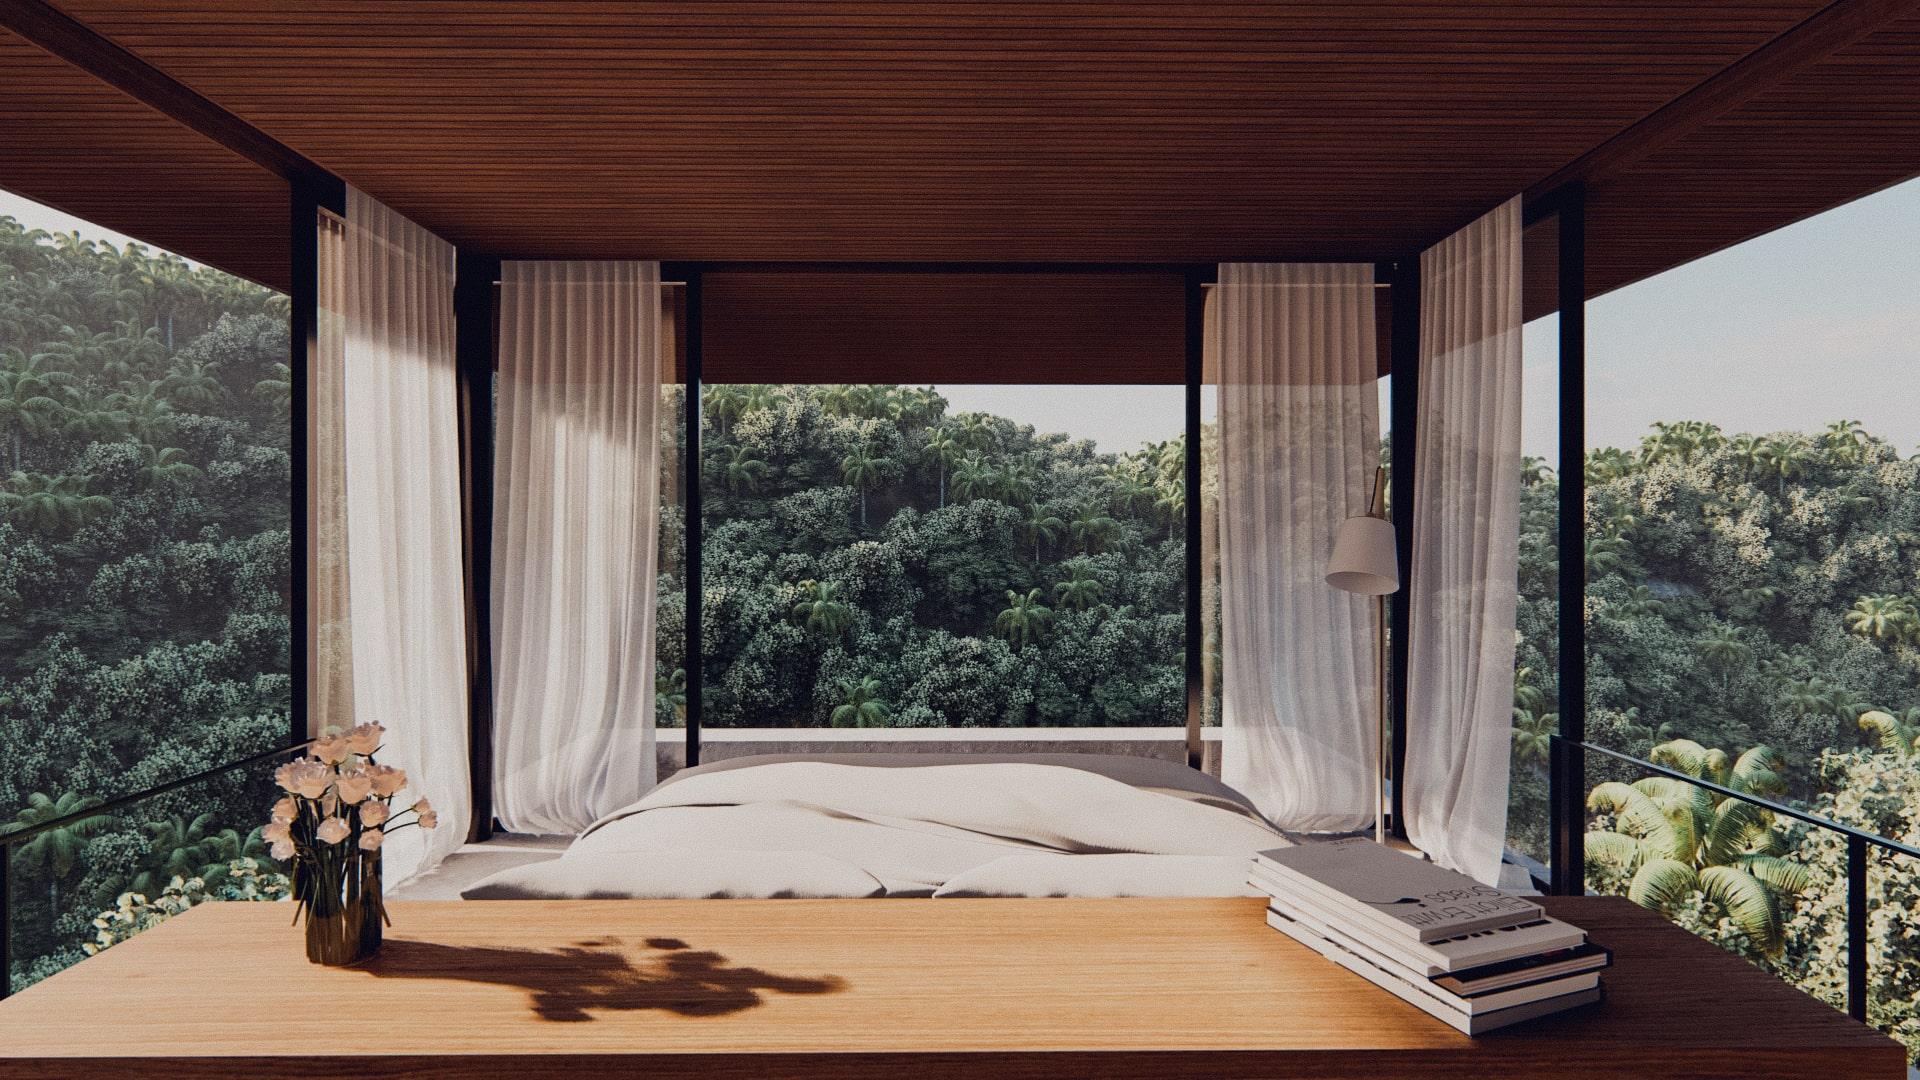 One bedroom pavilion hanging of the cliff in ubud bali bedroom